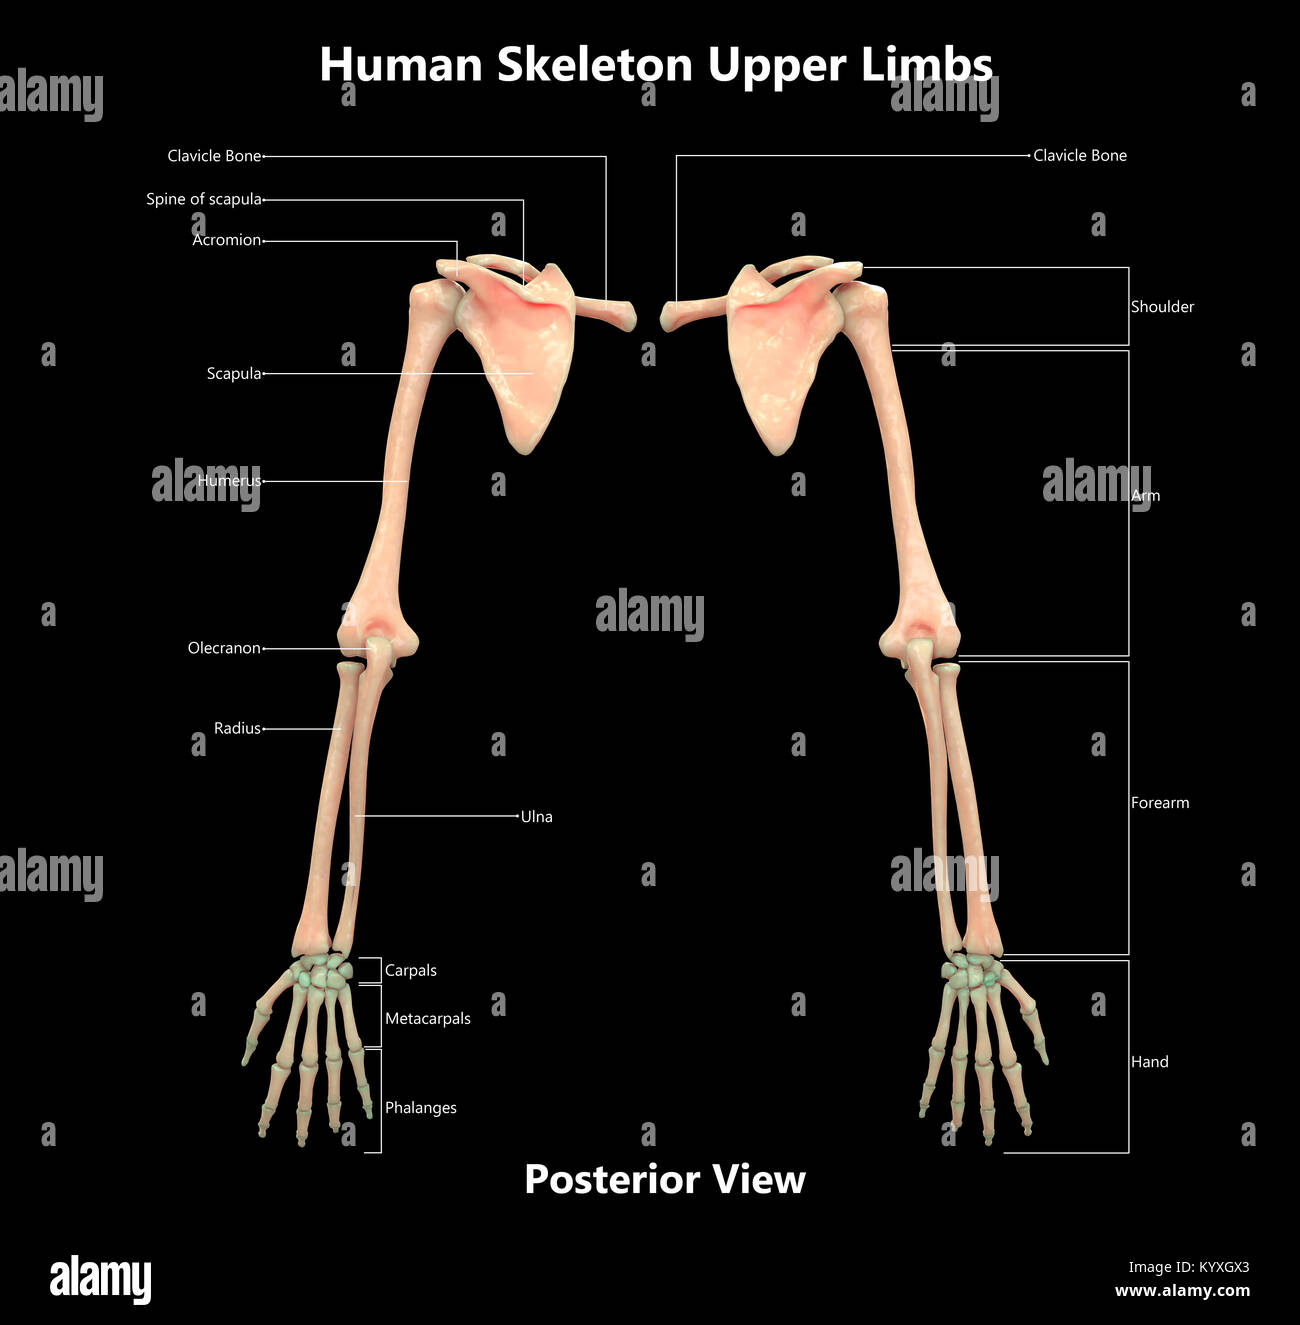 Human skeleton system upper limbs label design posterior view human skeleton system upper limbs label design posterior view anatomy ccuart Image collections